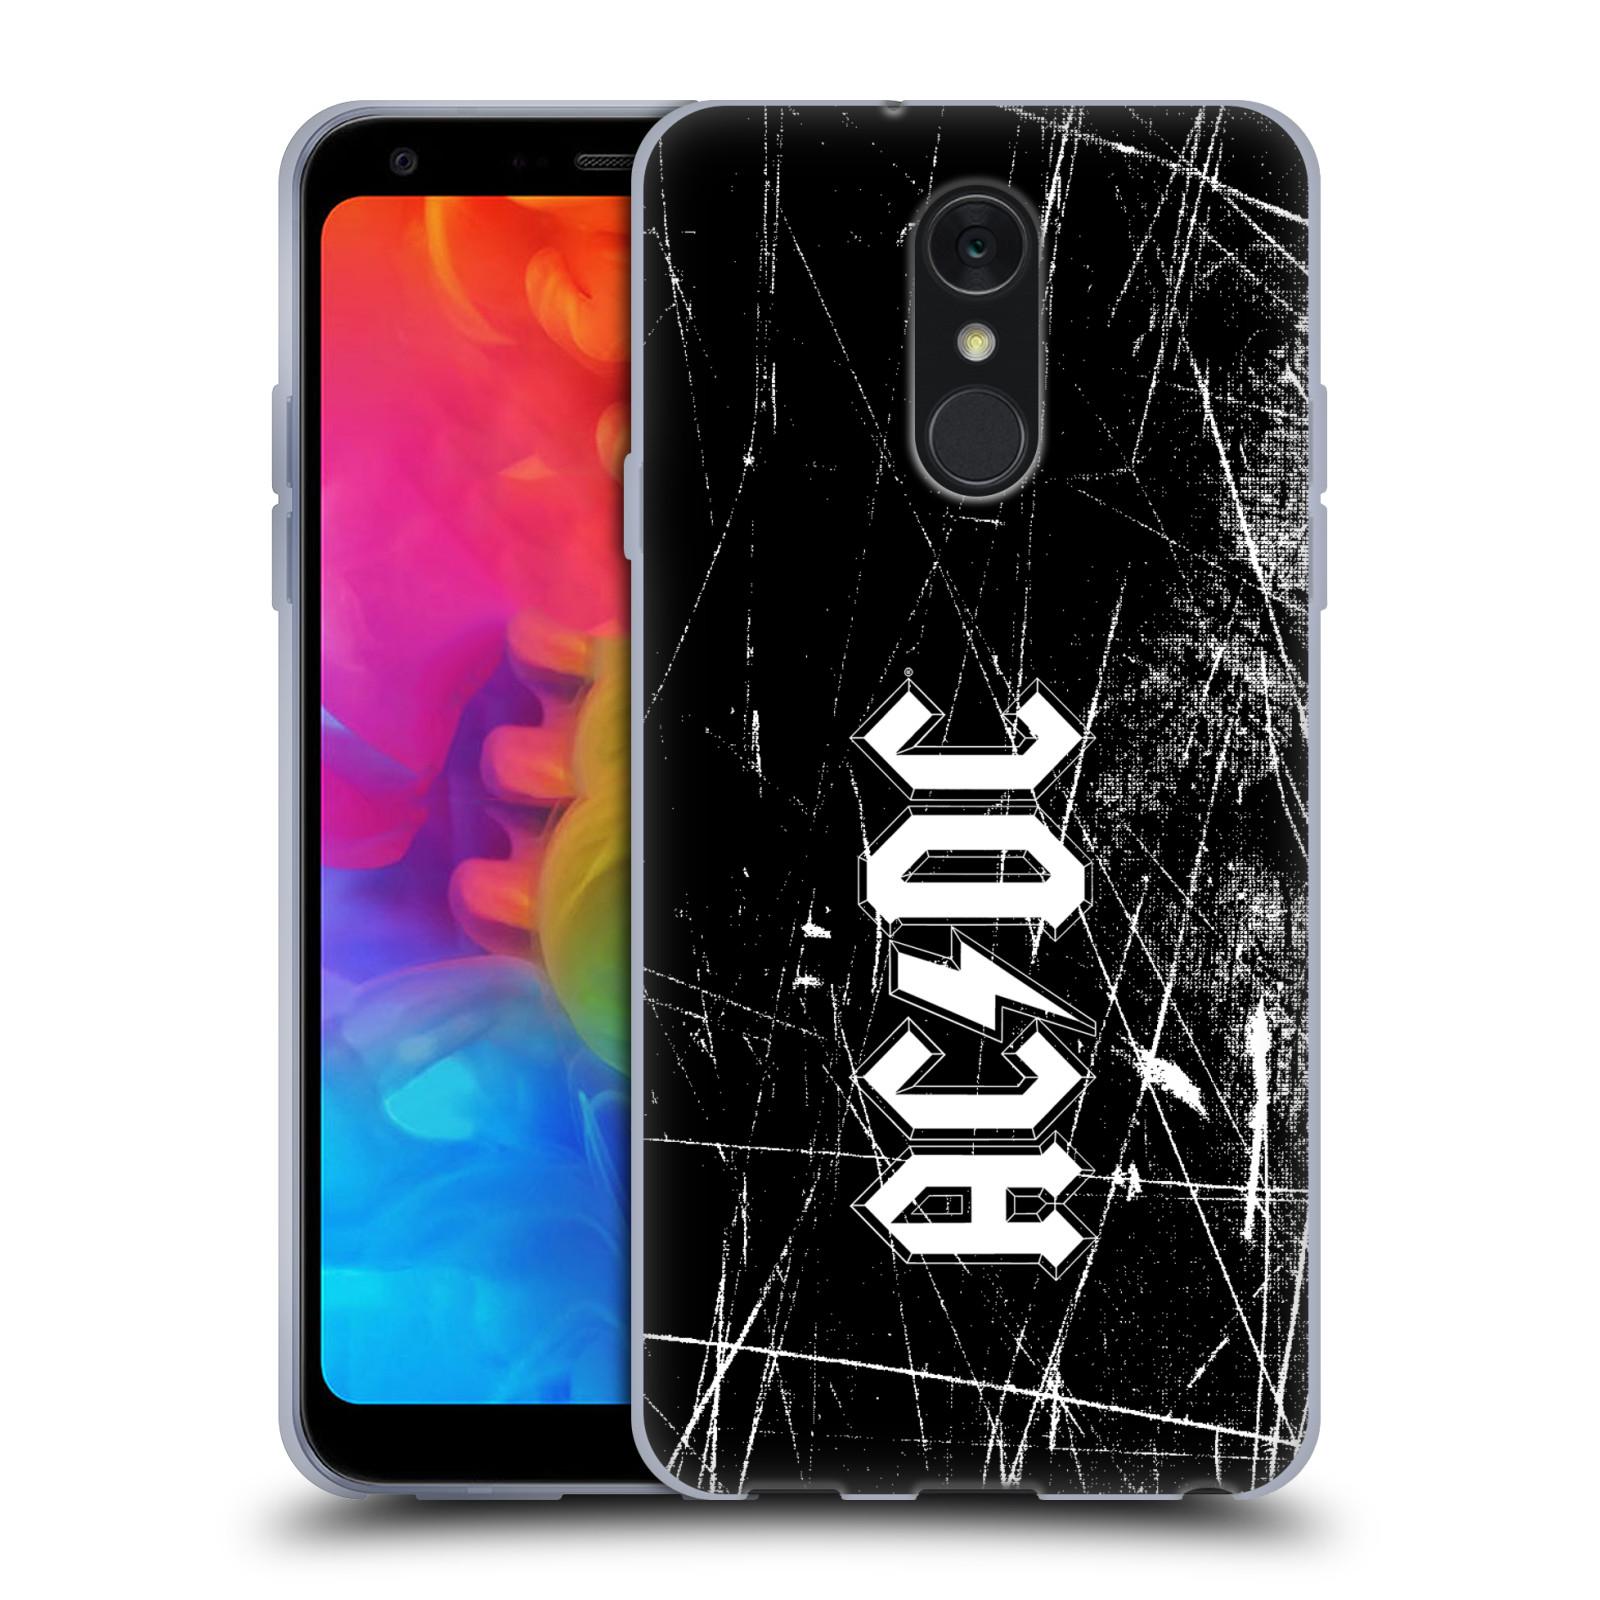 Silikonové pouzdro na mobil LG Q7 - Head Case - AC/DC Černobílé logo